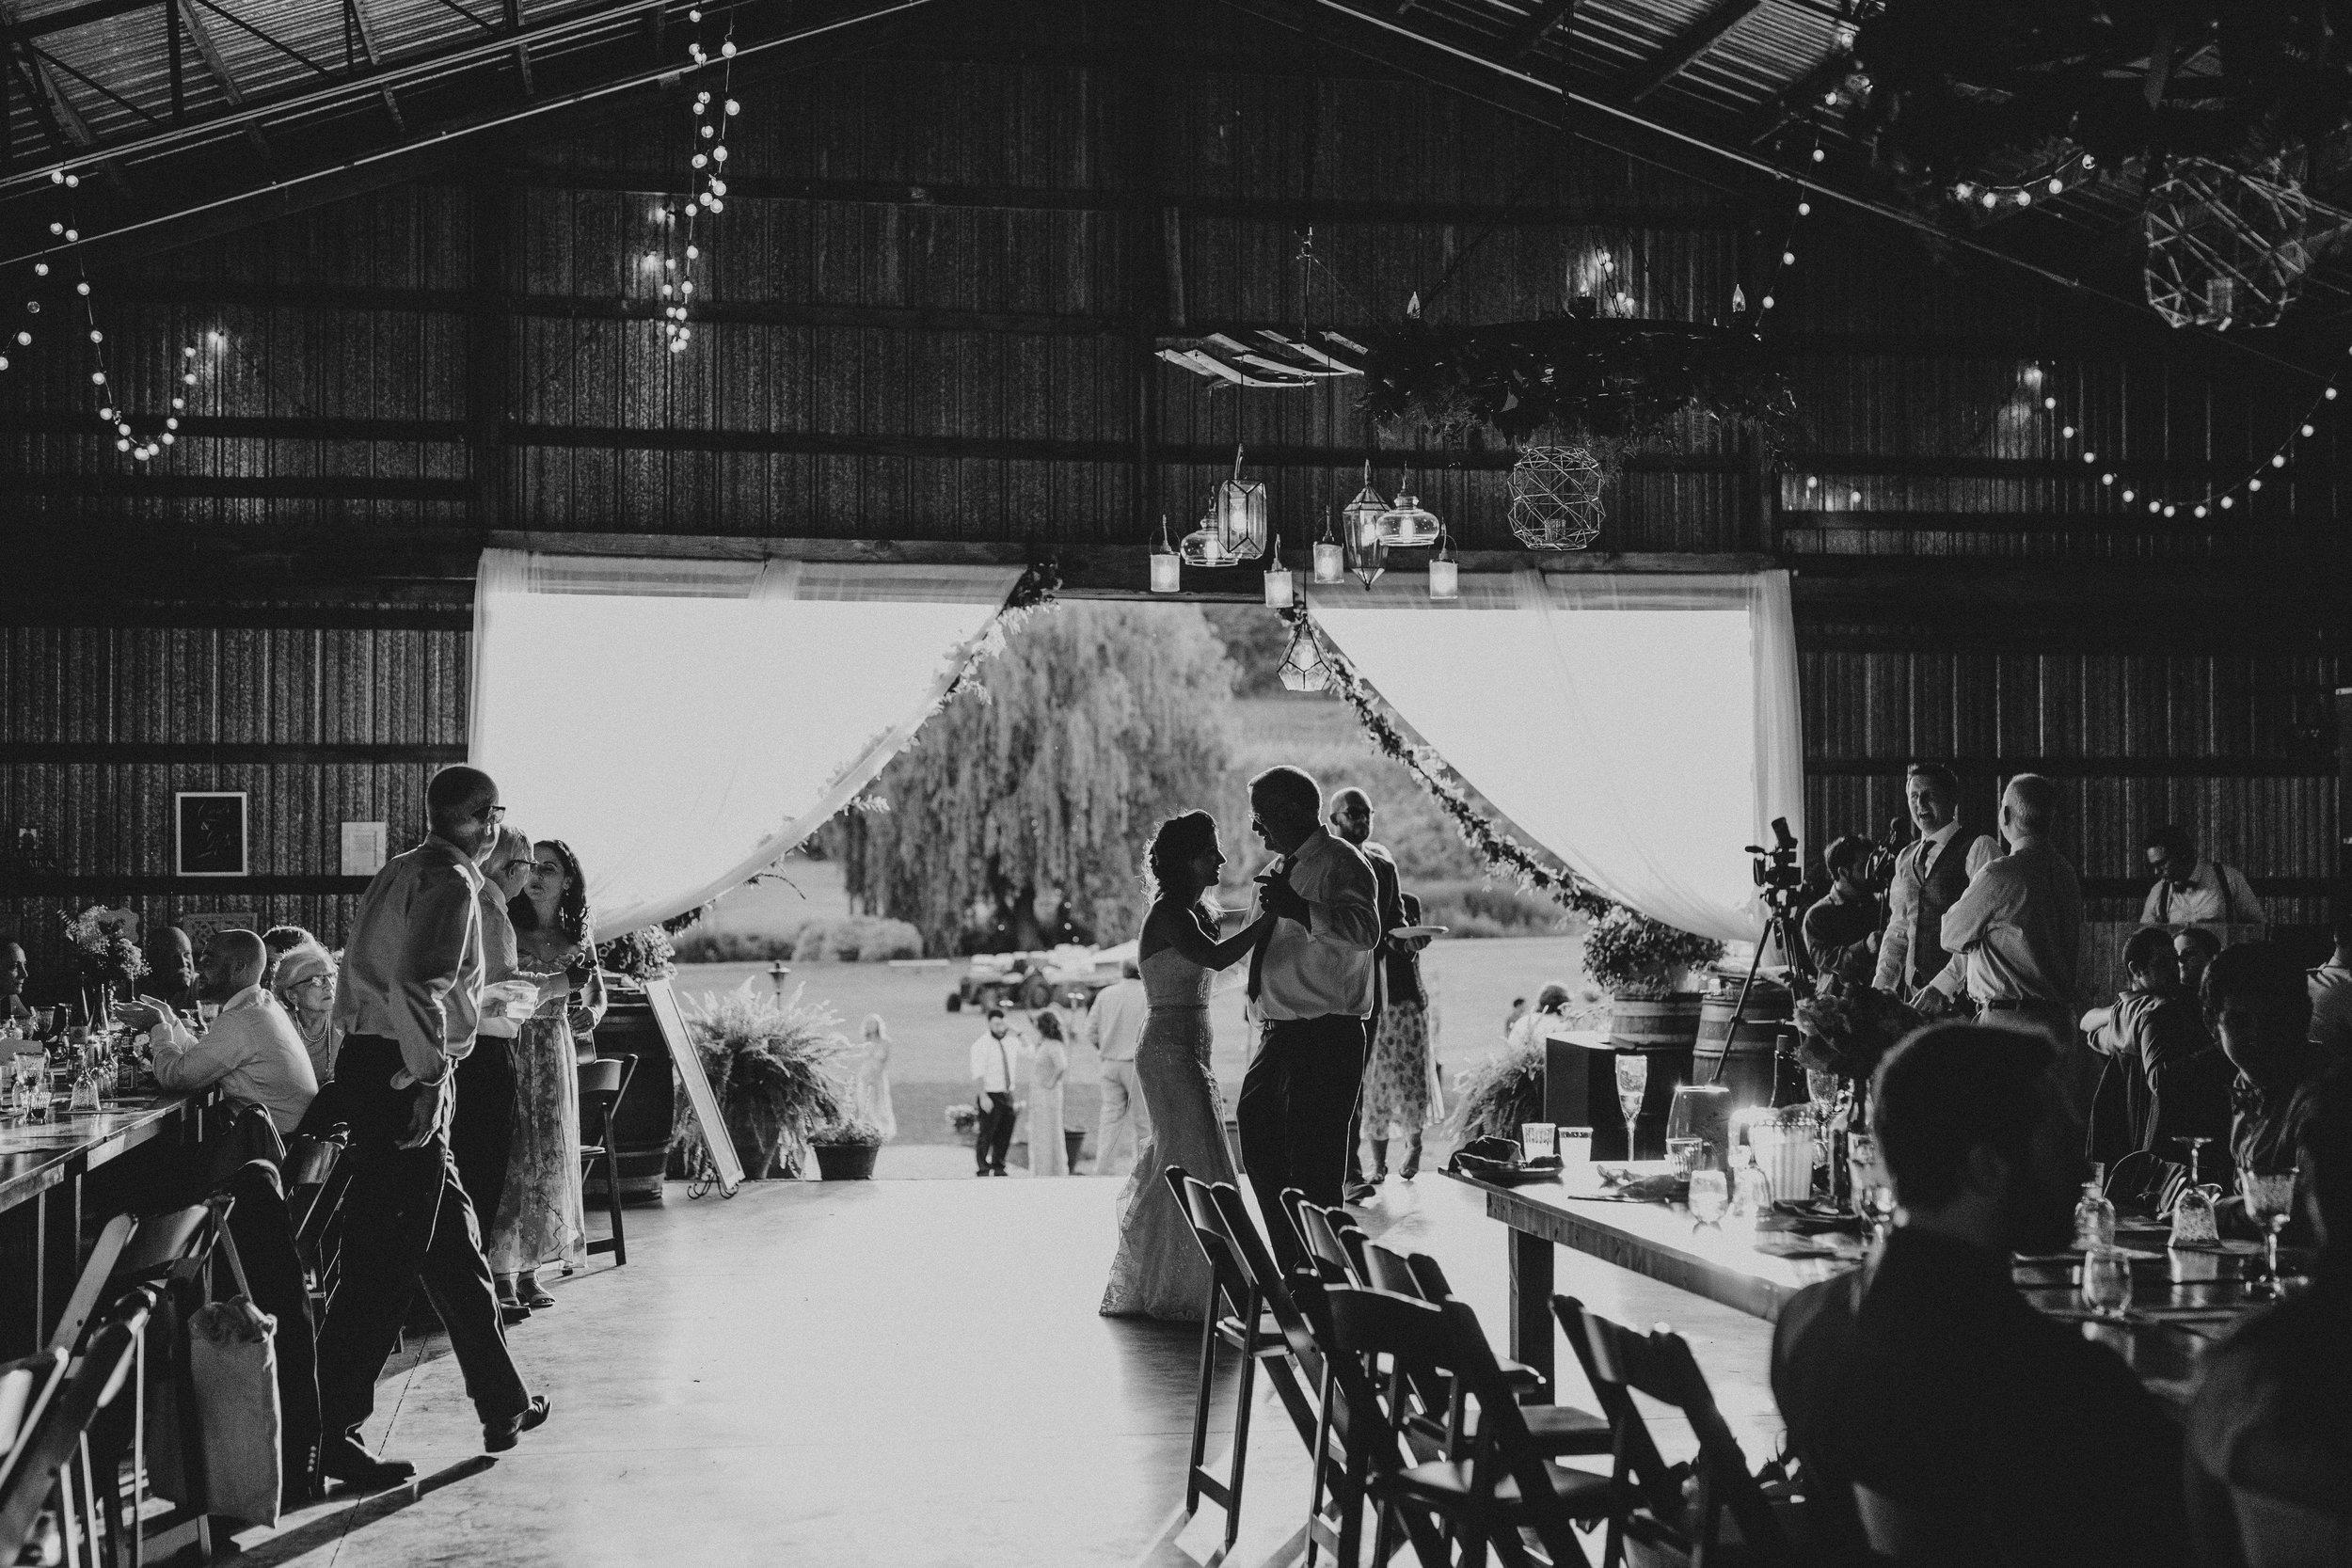 nostrano_vineyards_wedding_0074.JPG